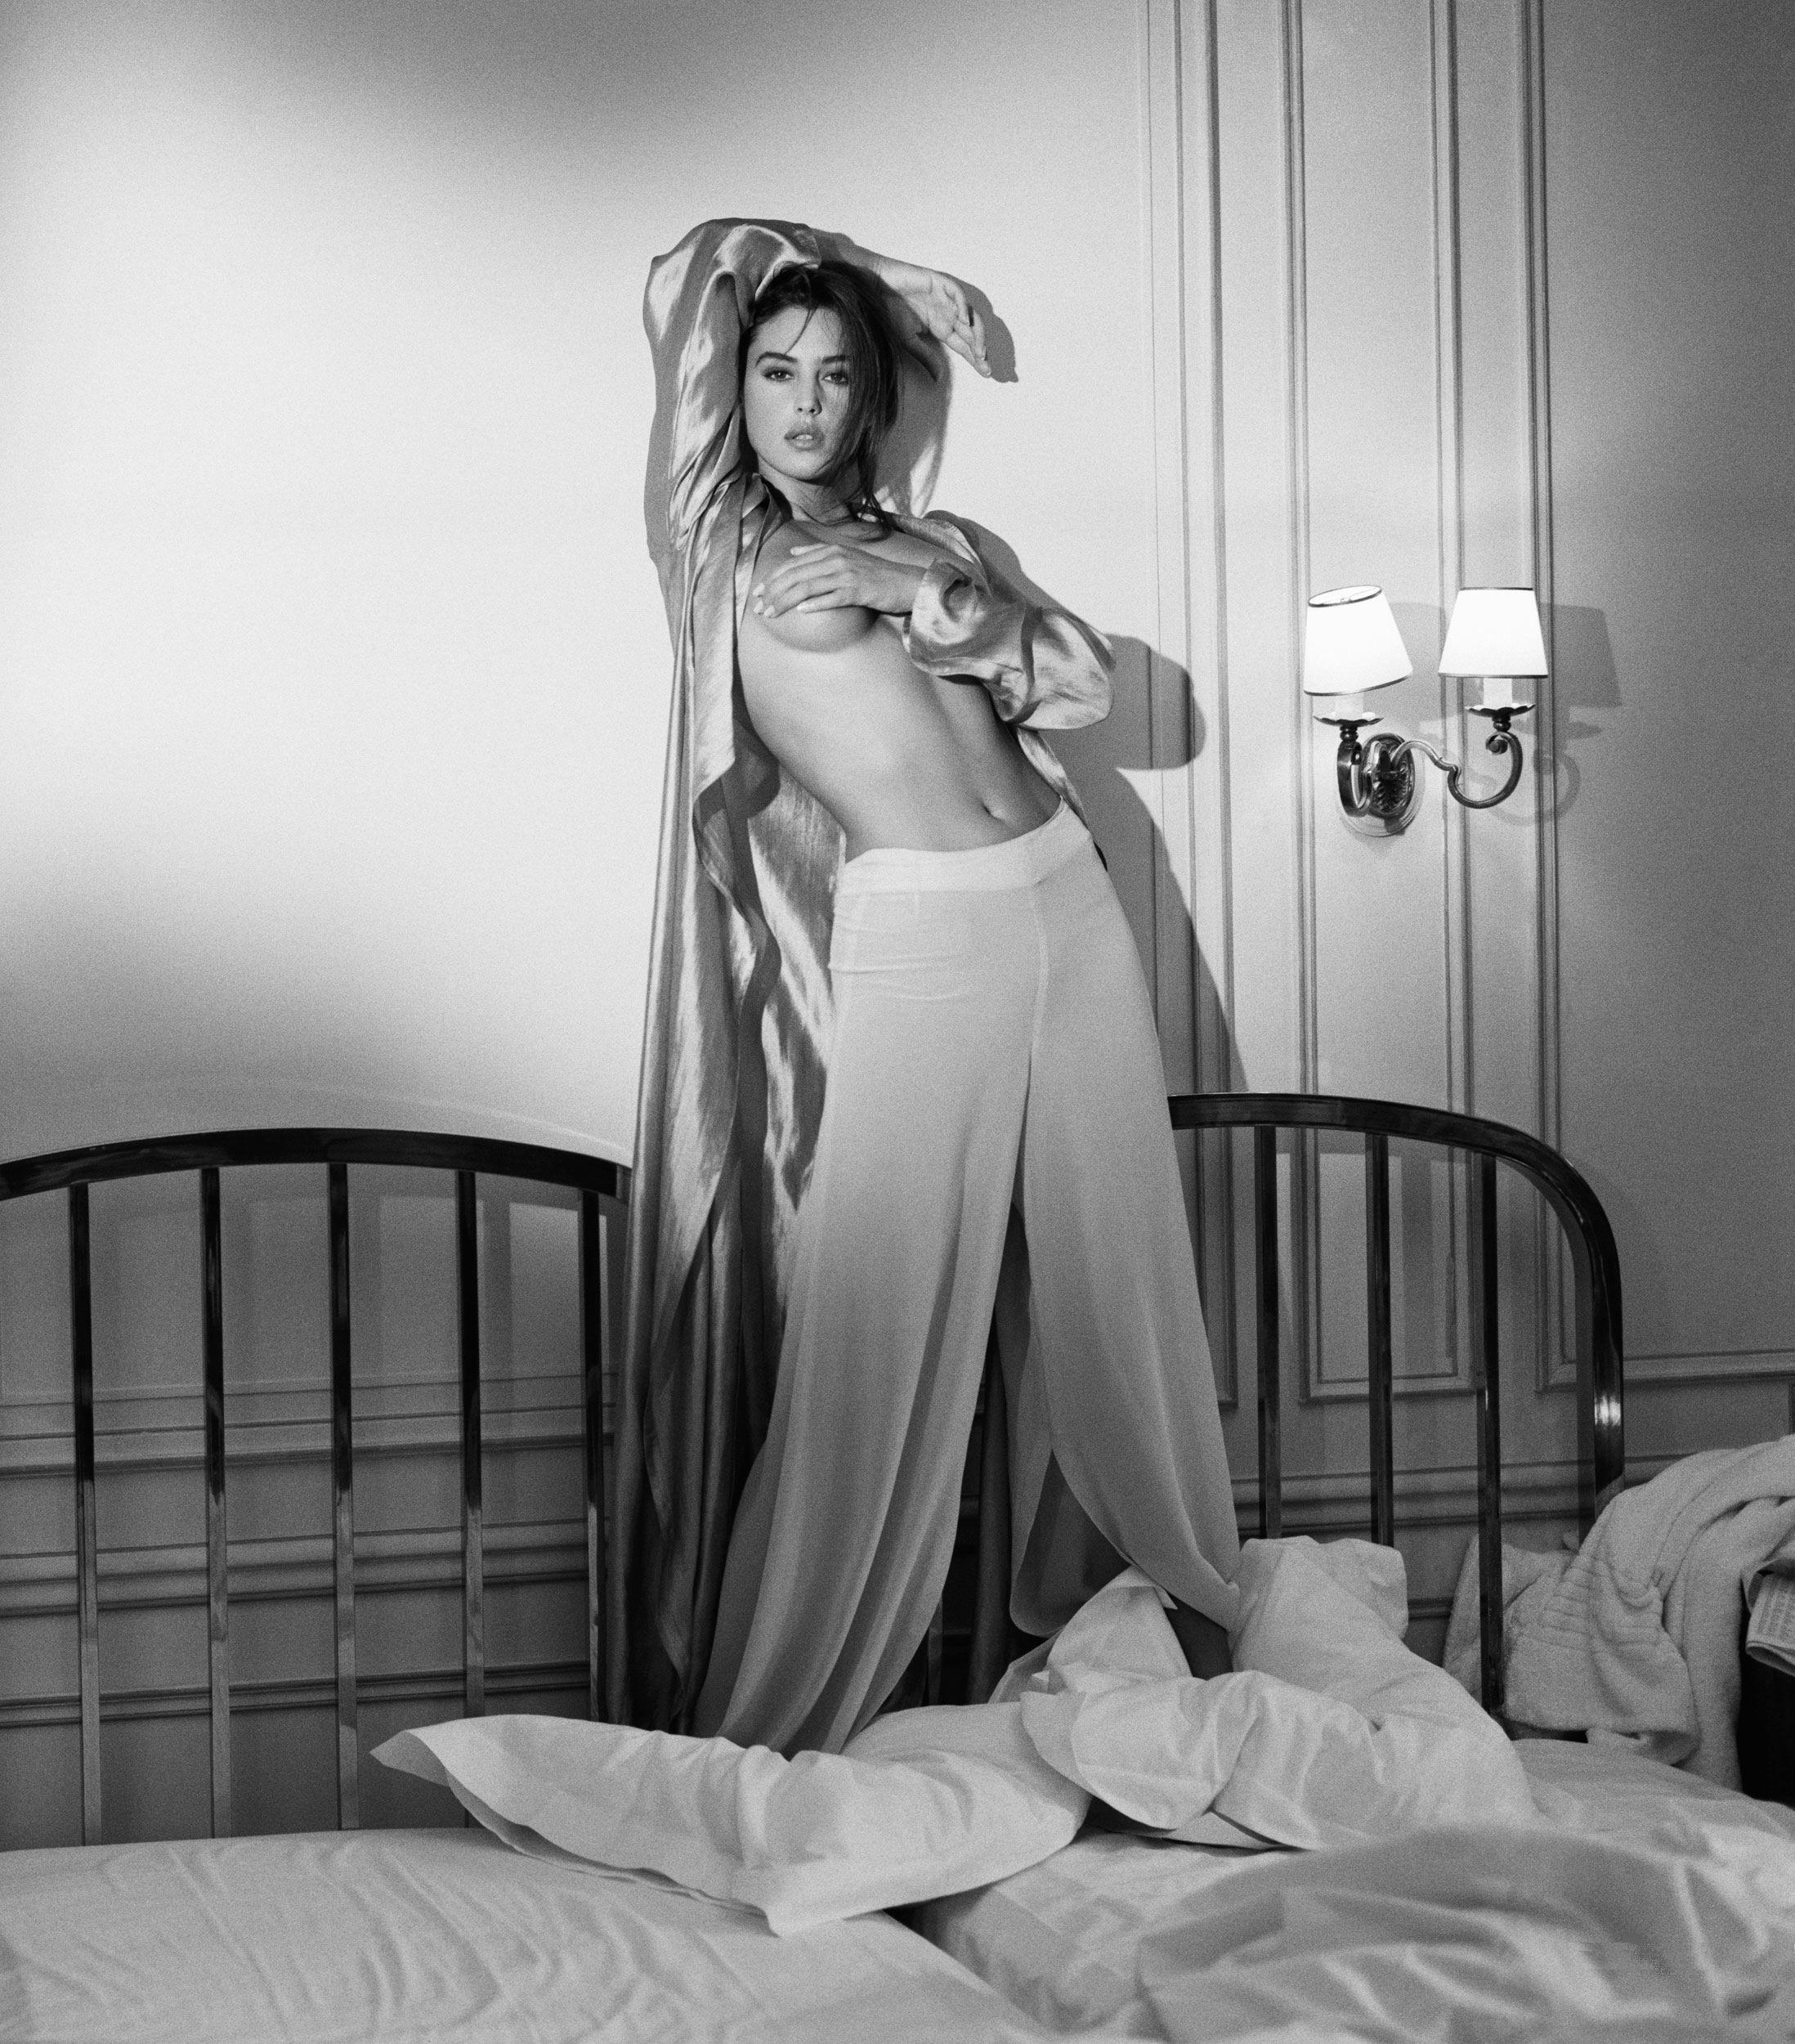 Филем онлаен отрывок эротика моники белуччи 20 фотография